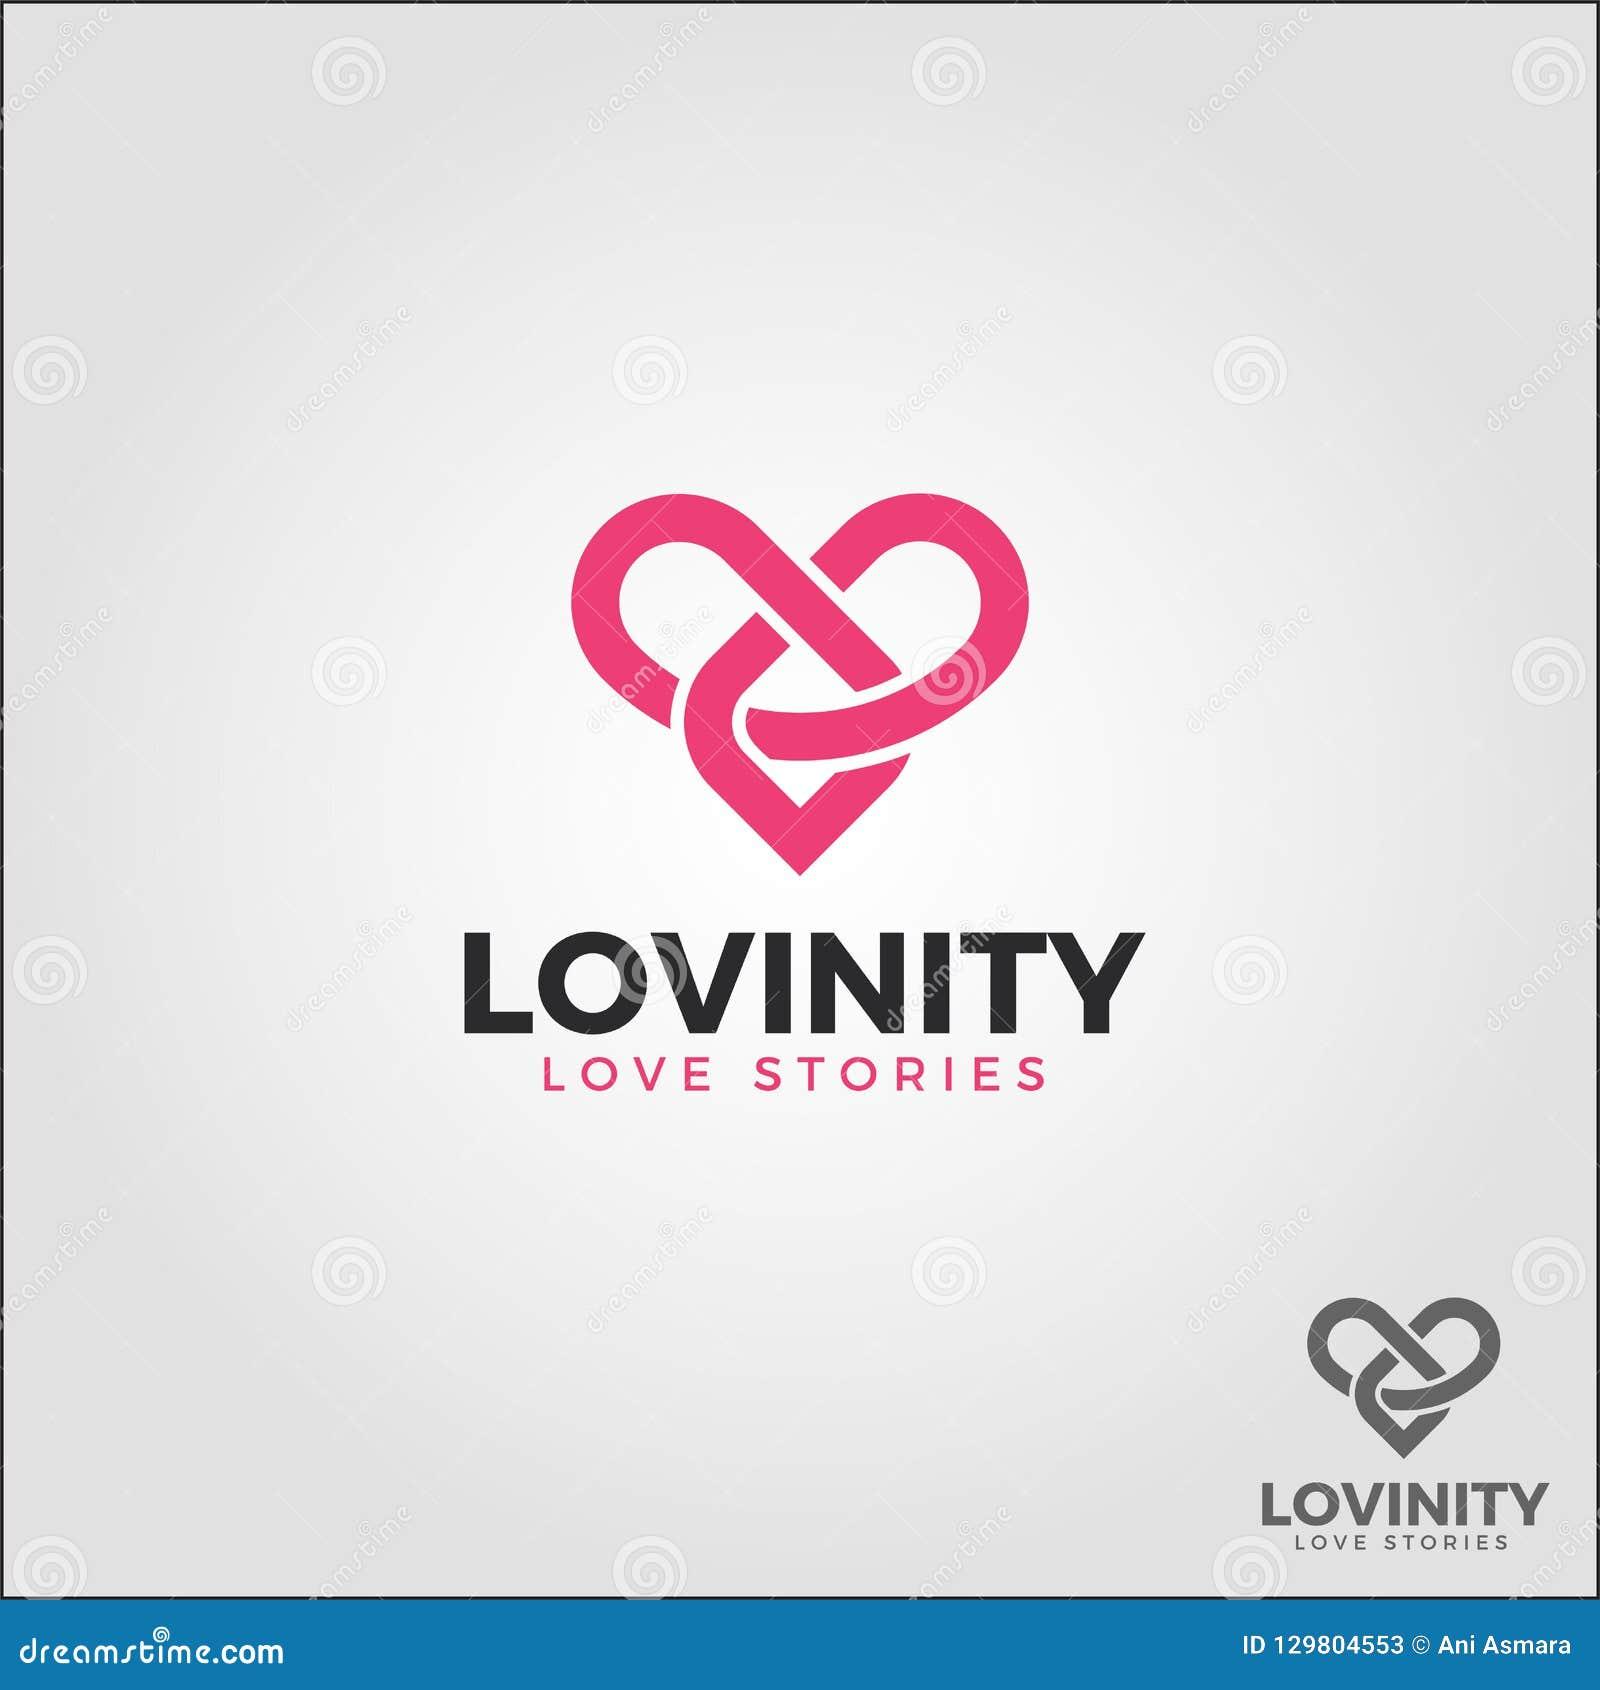 Lovinity/amor del infinito - logotipo eterno del amor